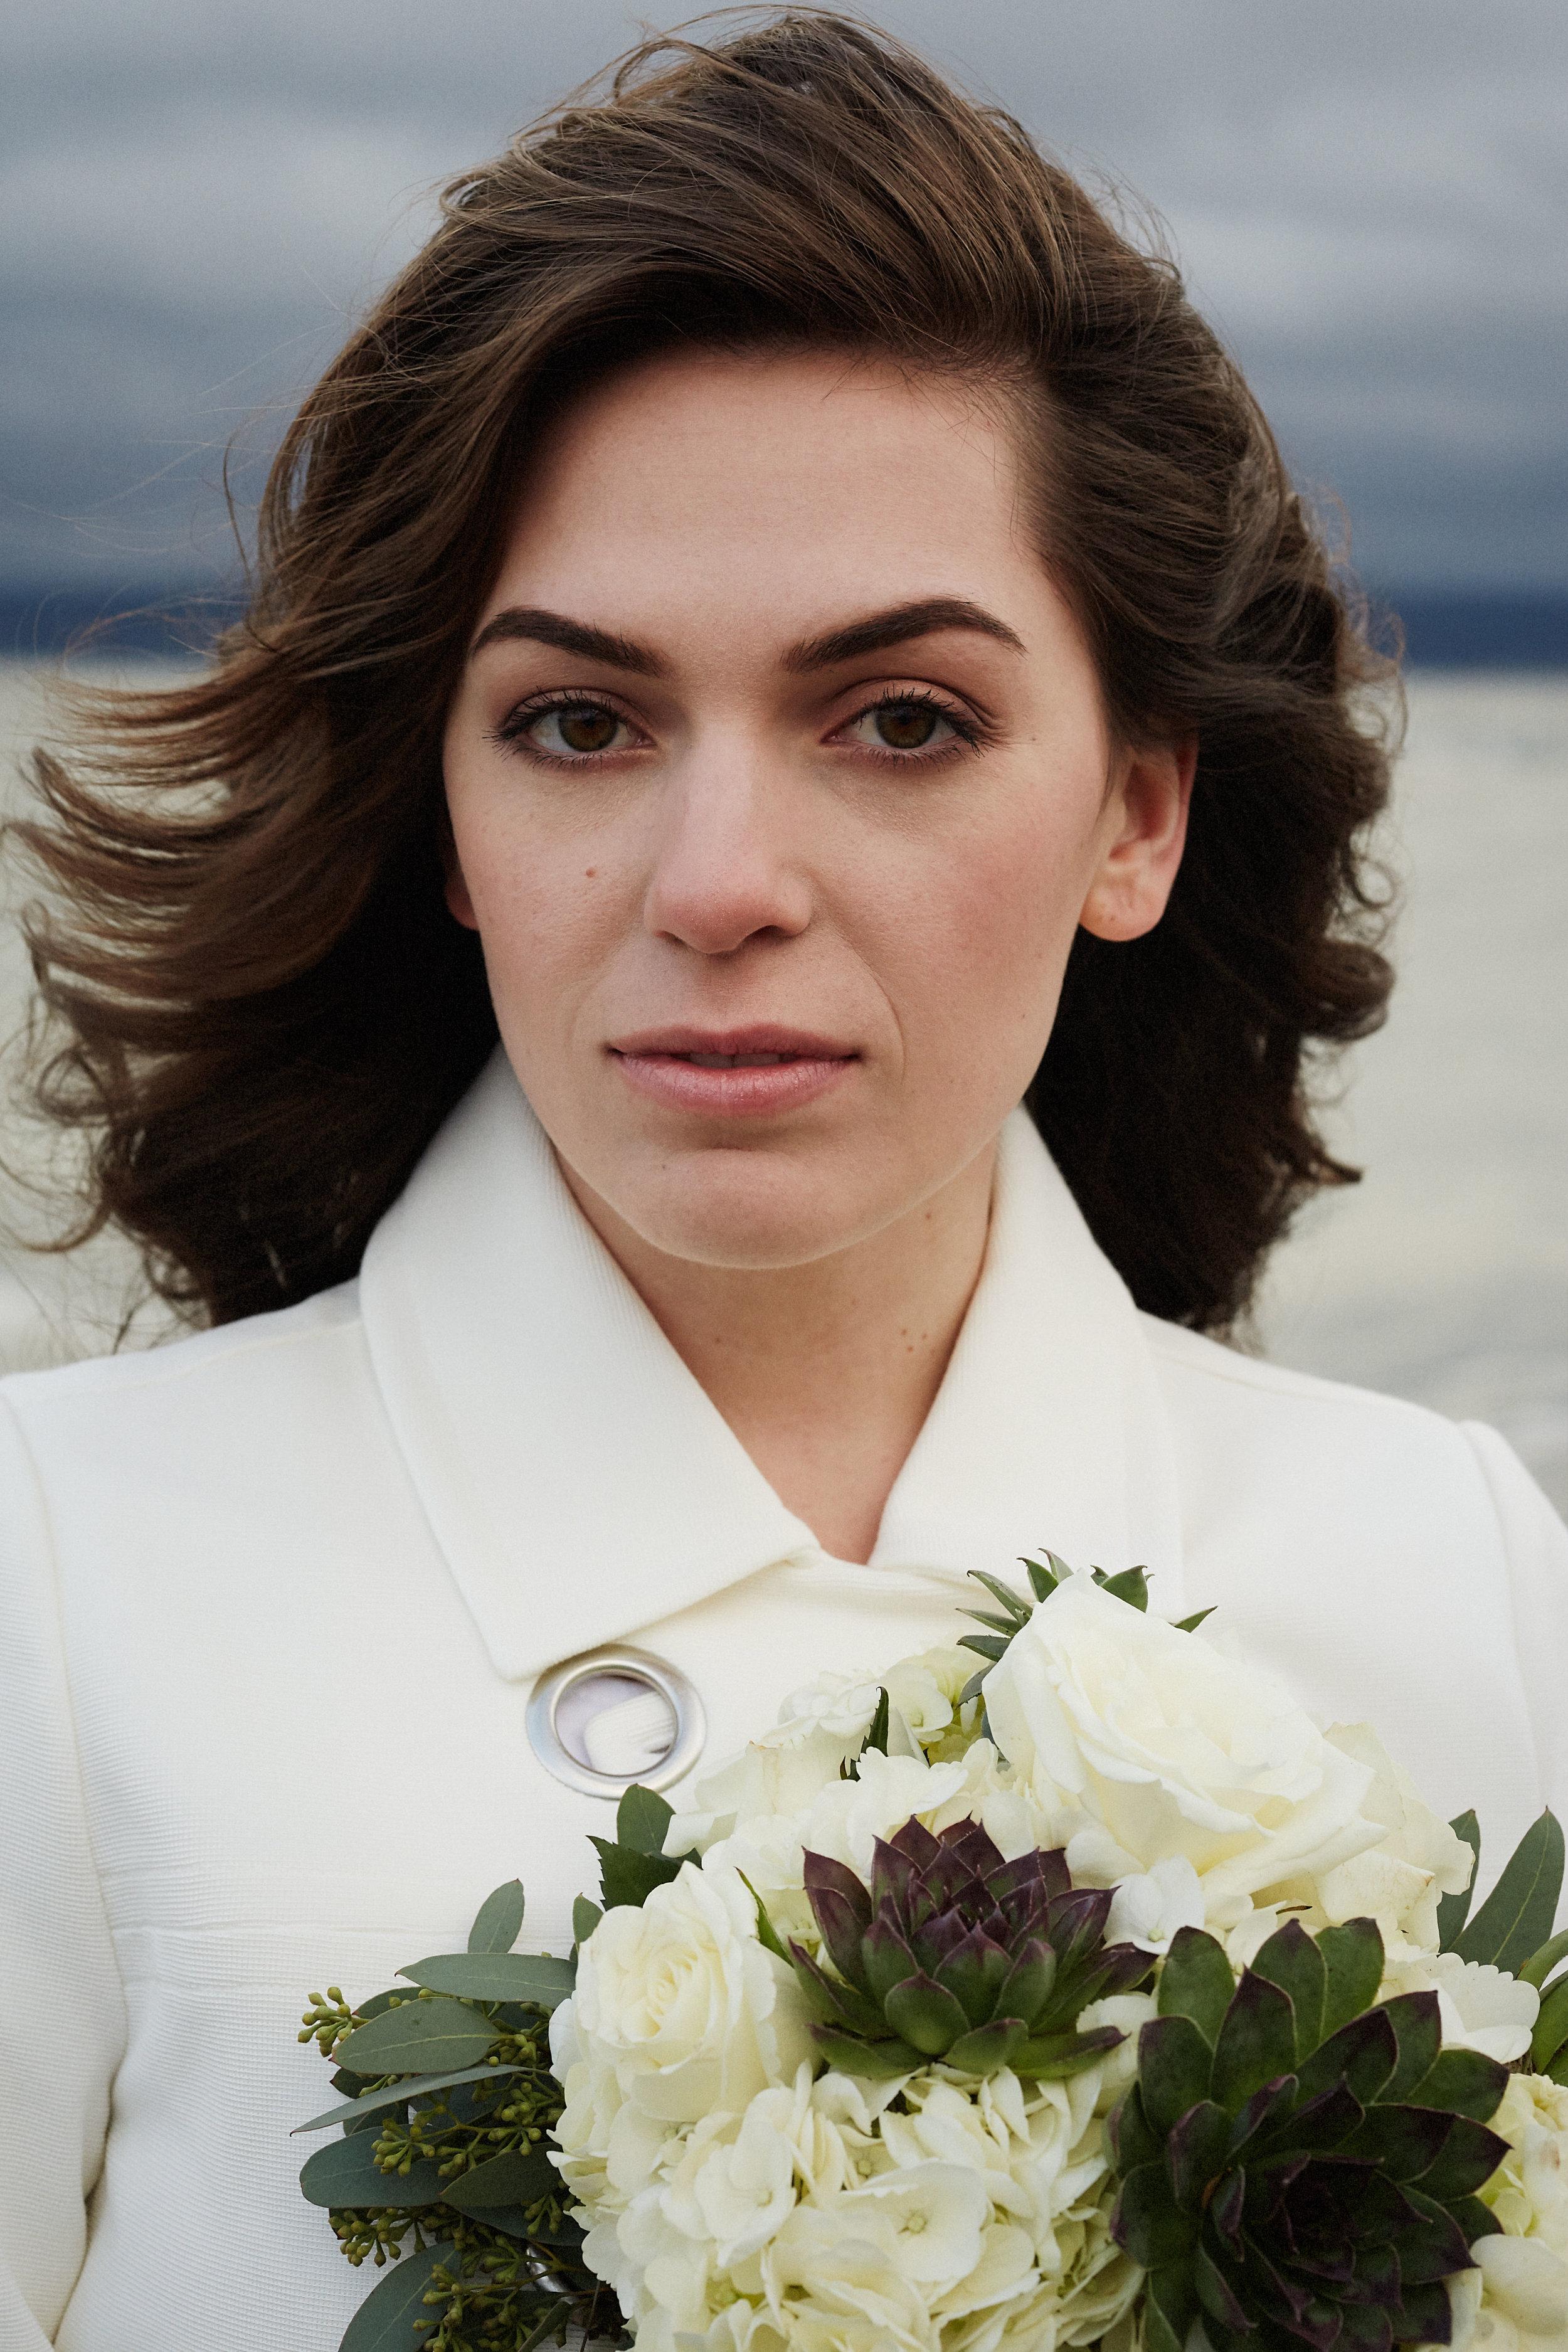 FELICIA_KAISER_WEDDING 74.jpg